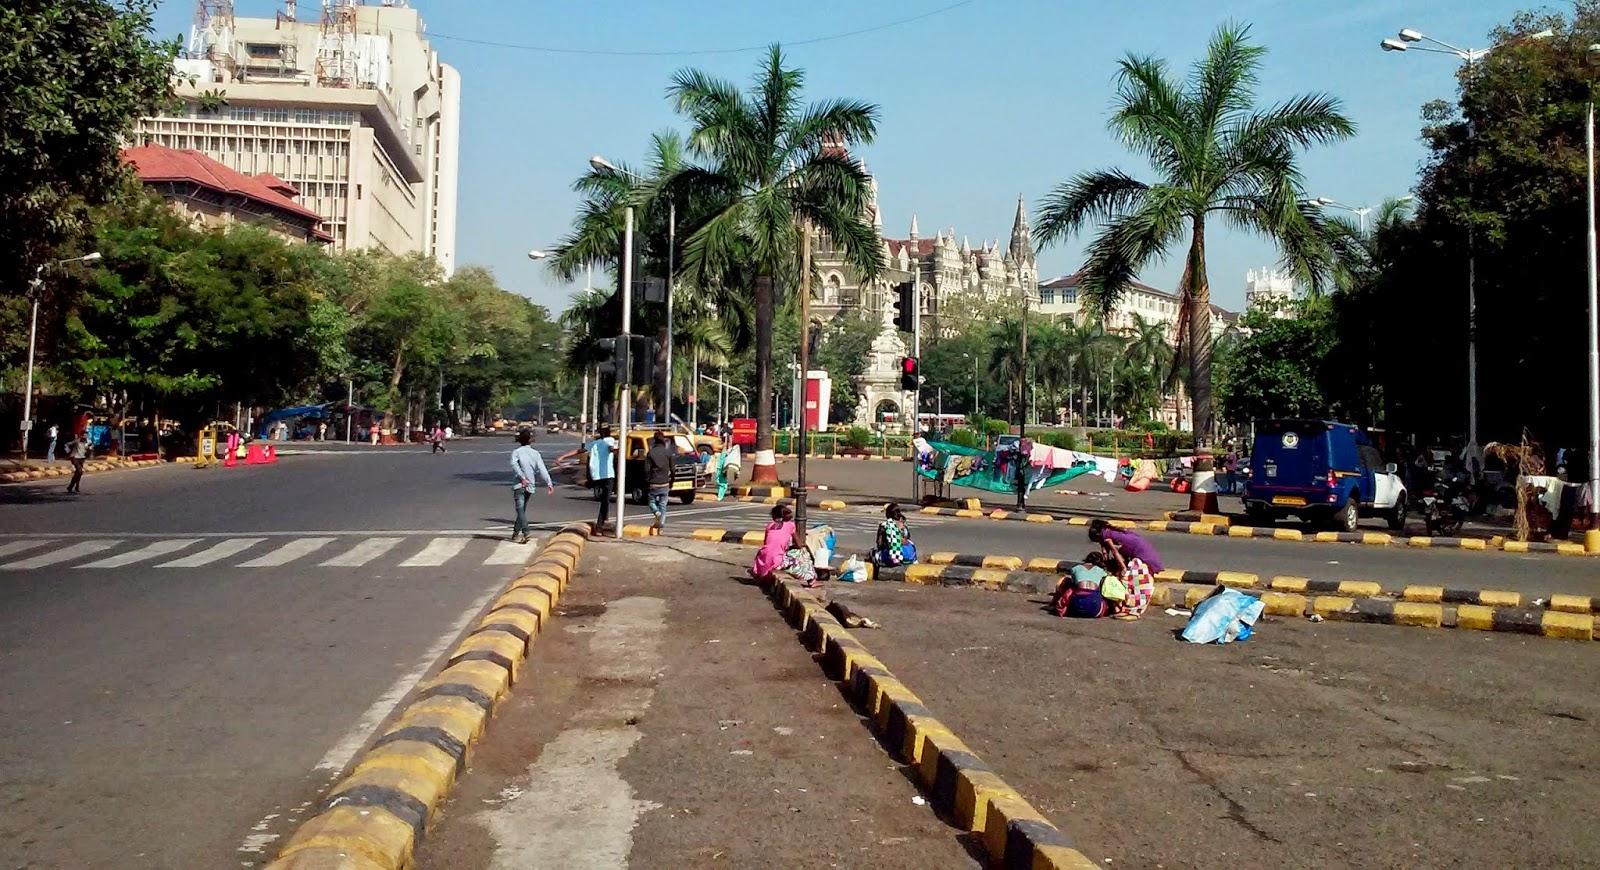 dimanche a mumbai